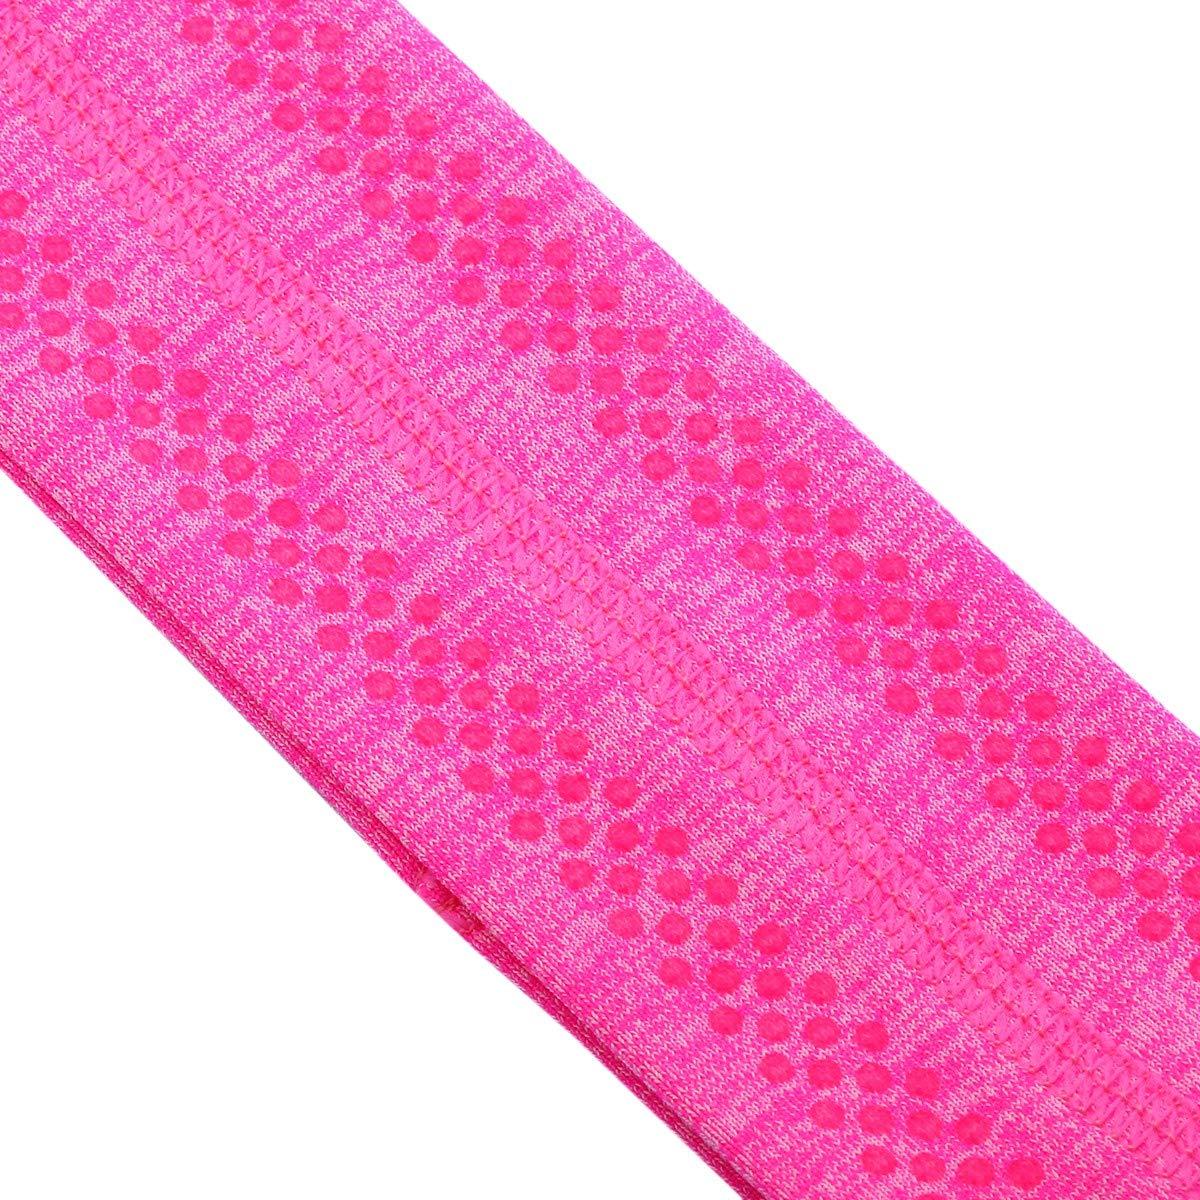 Workout Crossfit Pack of 2 Sportmusies Yoga Headbands for Men Women,Moisture Wicking Sport Sweatbands for Running Cycling